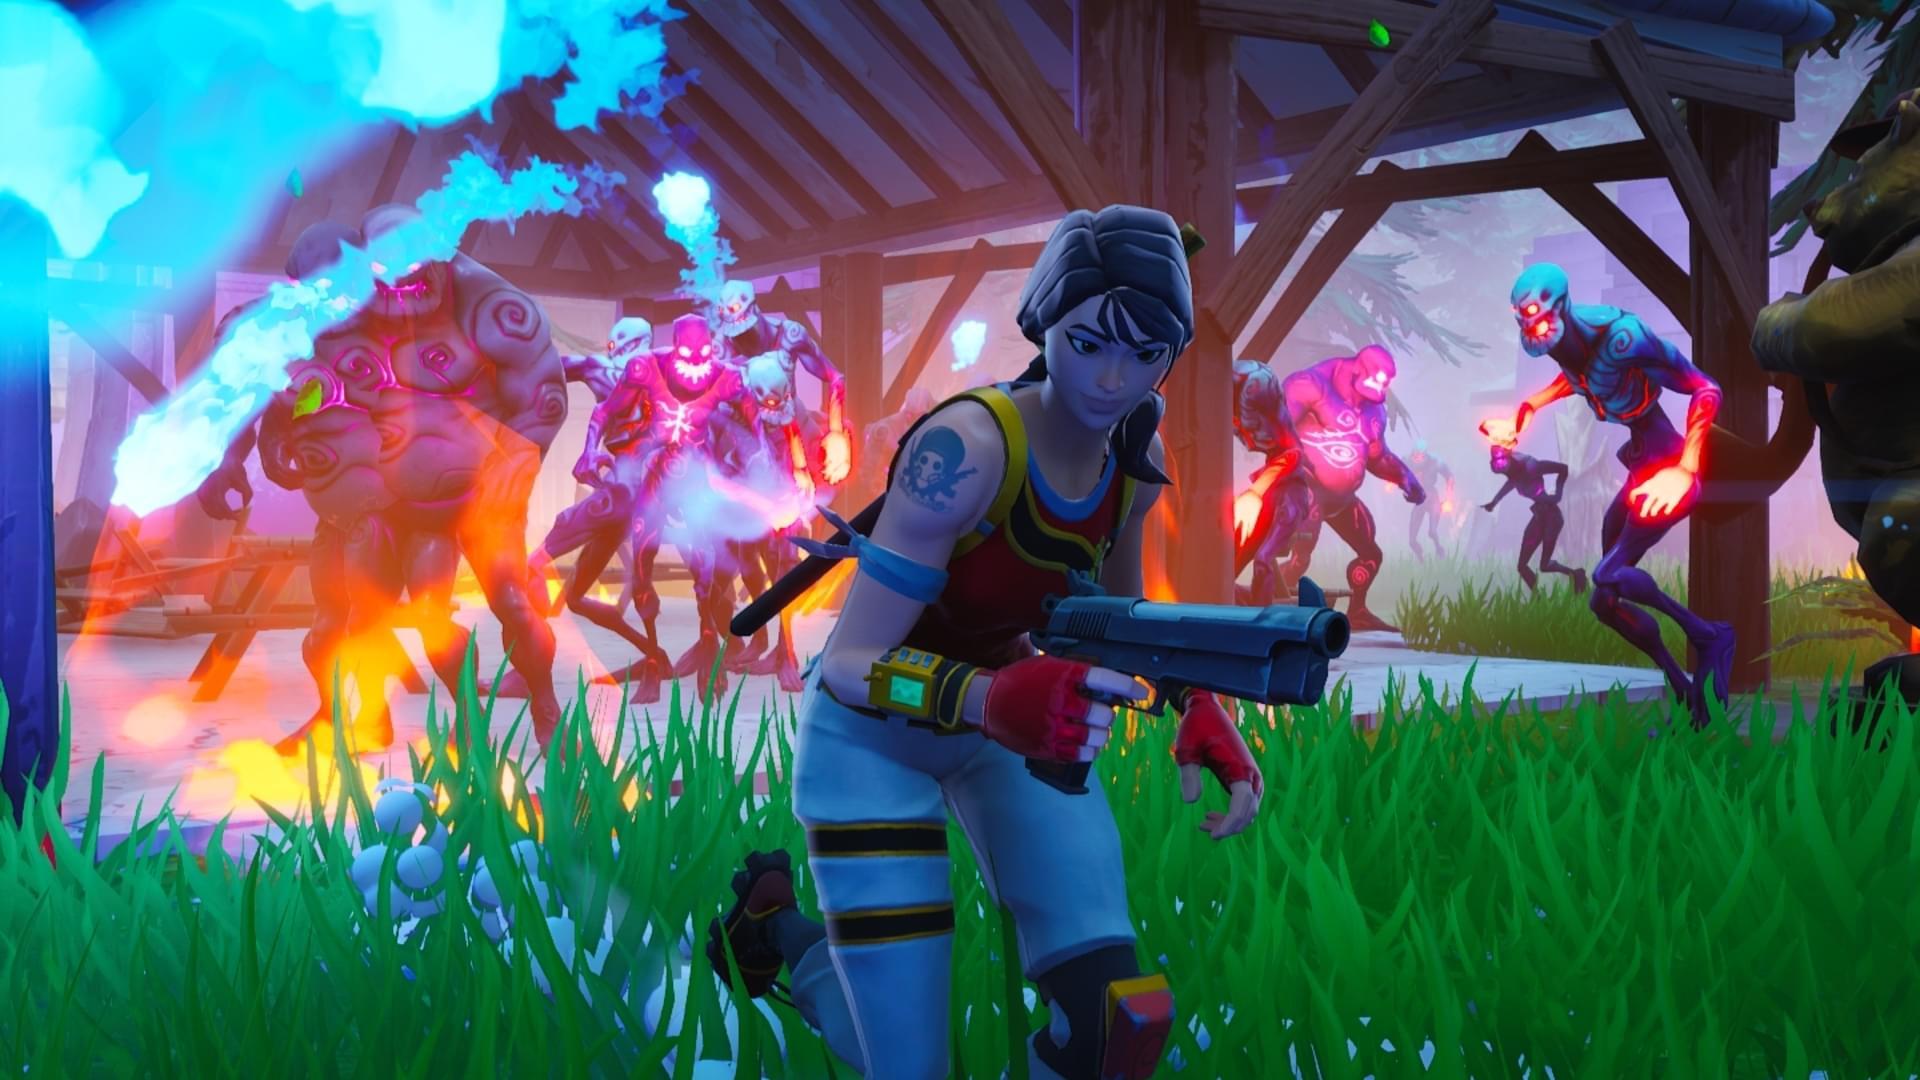 fortnite creative island zombie apocalypse 2620 9275 7371 - fortnite multiplayer